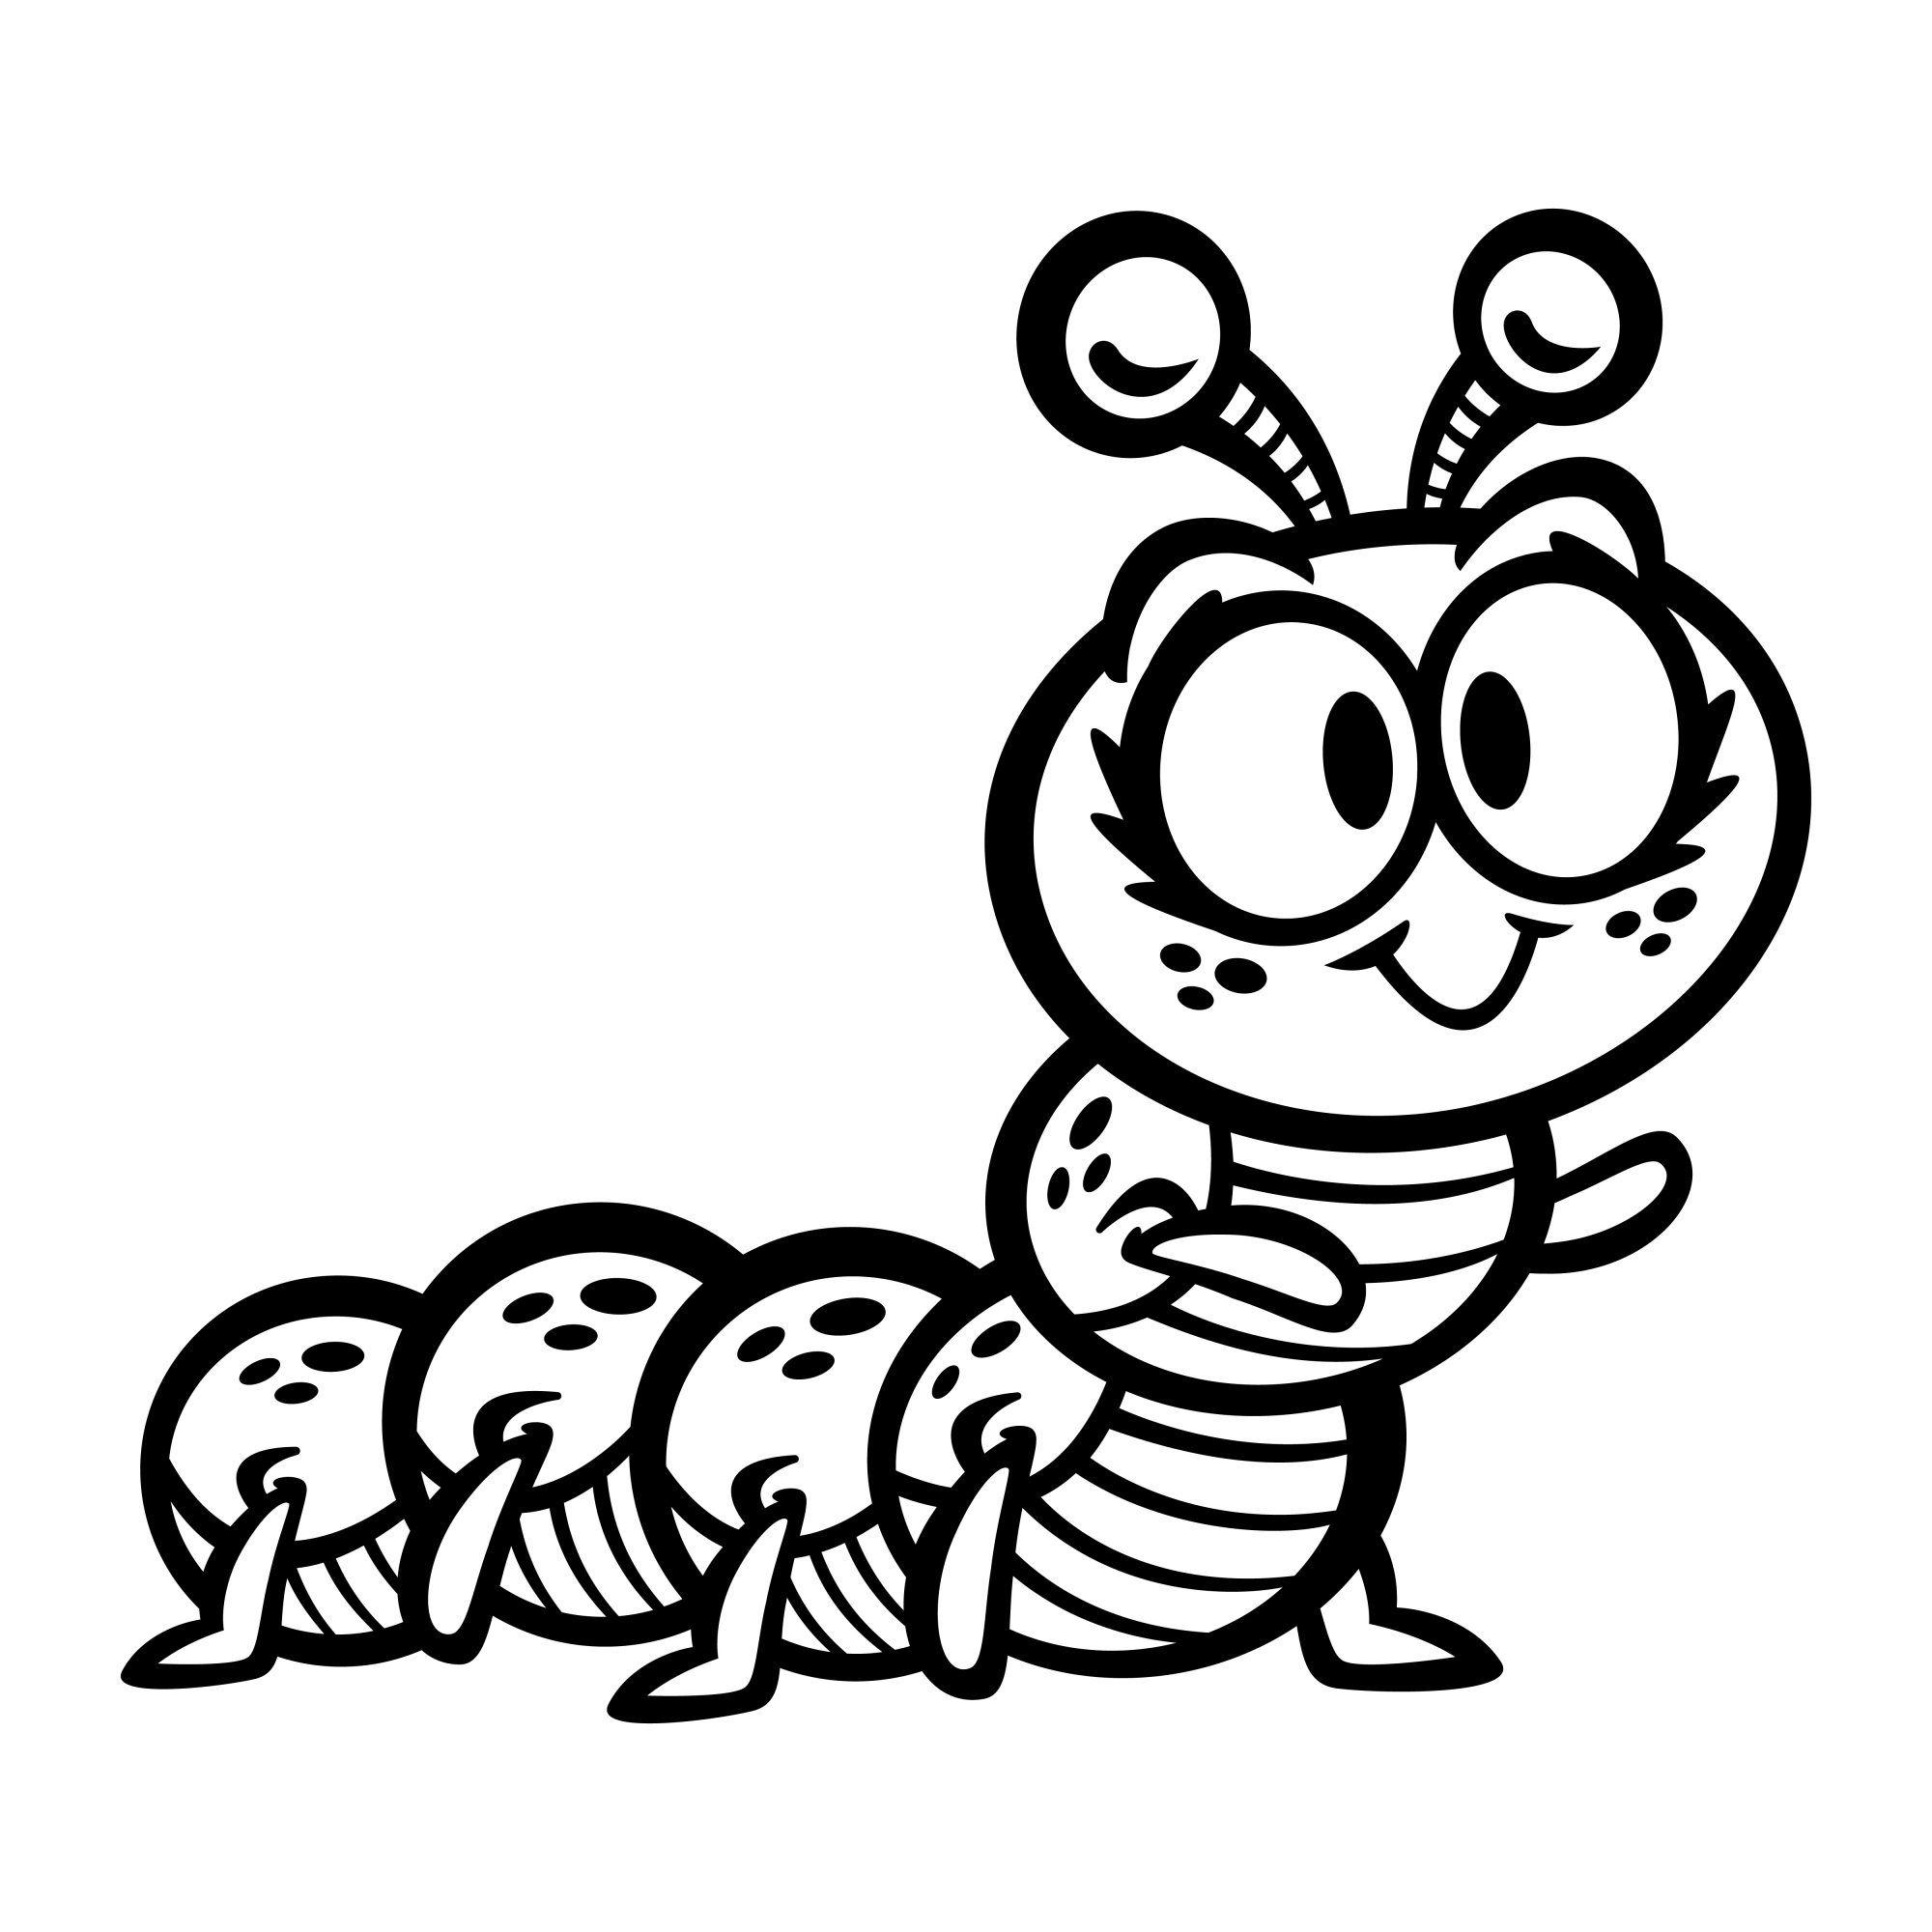 Caterpillar Bug Cartoon Clip Art Clipart Black And White Bug Cartoon